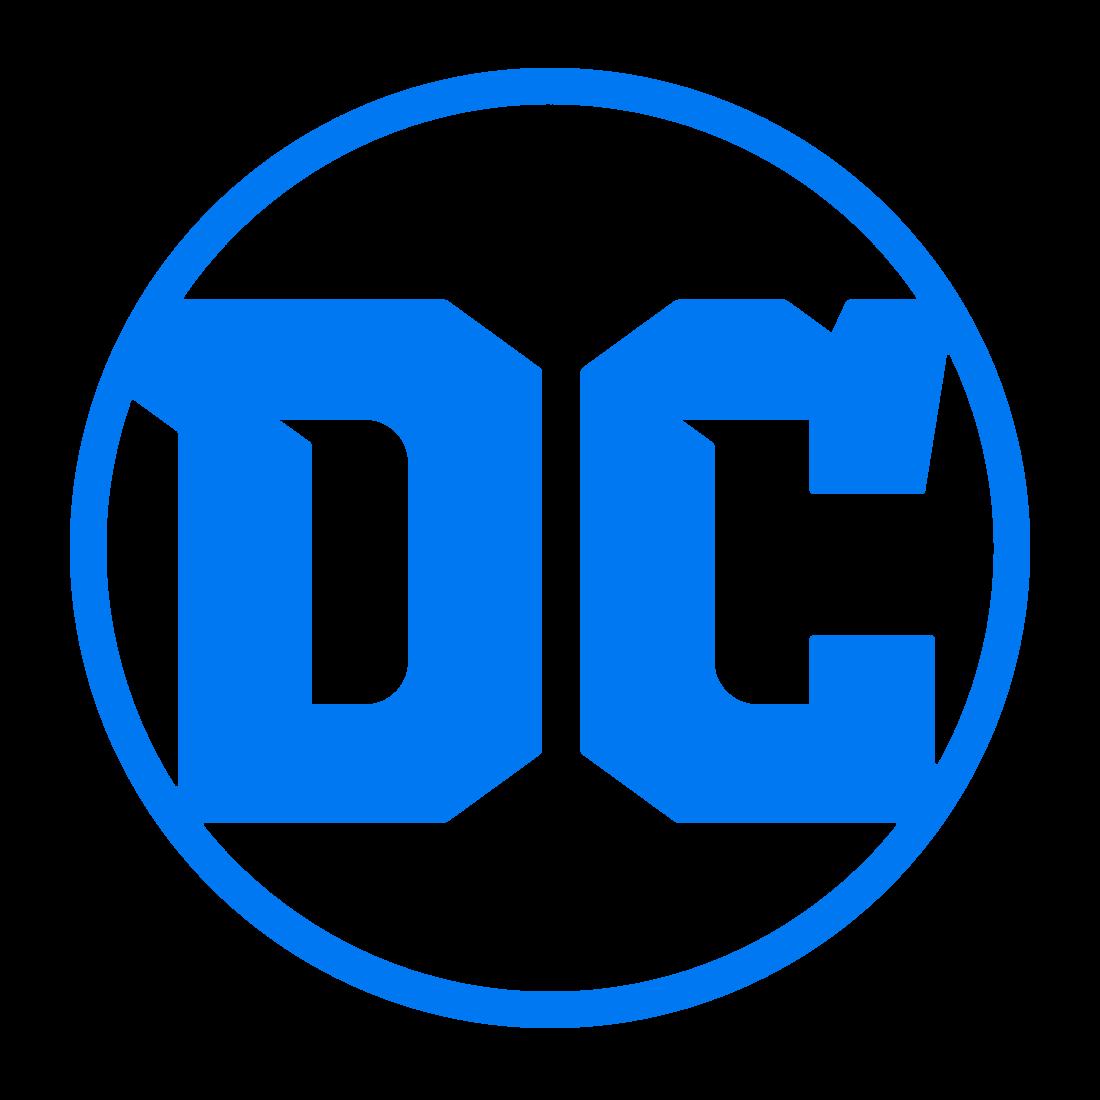 who created DC Comics